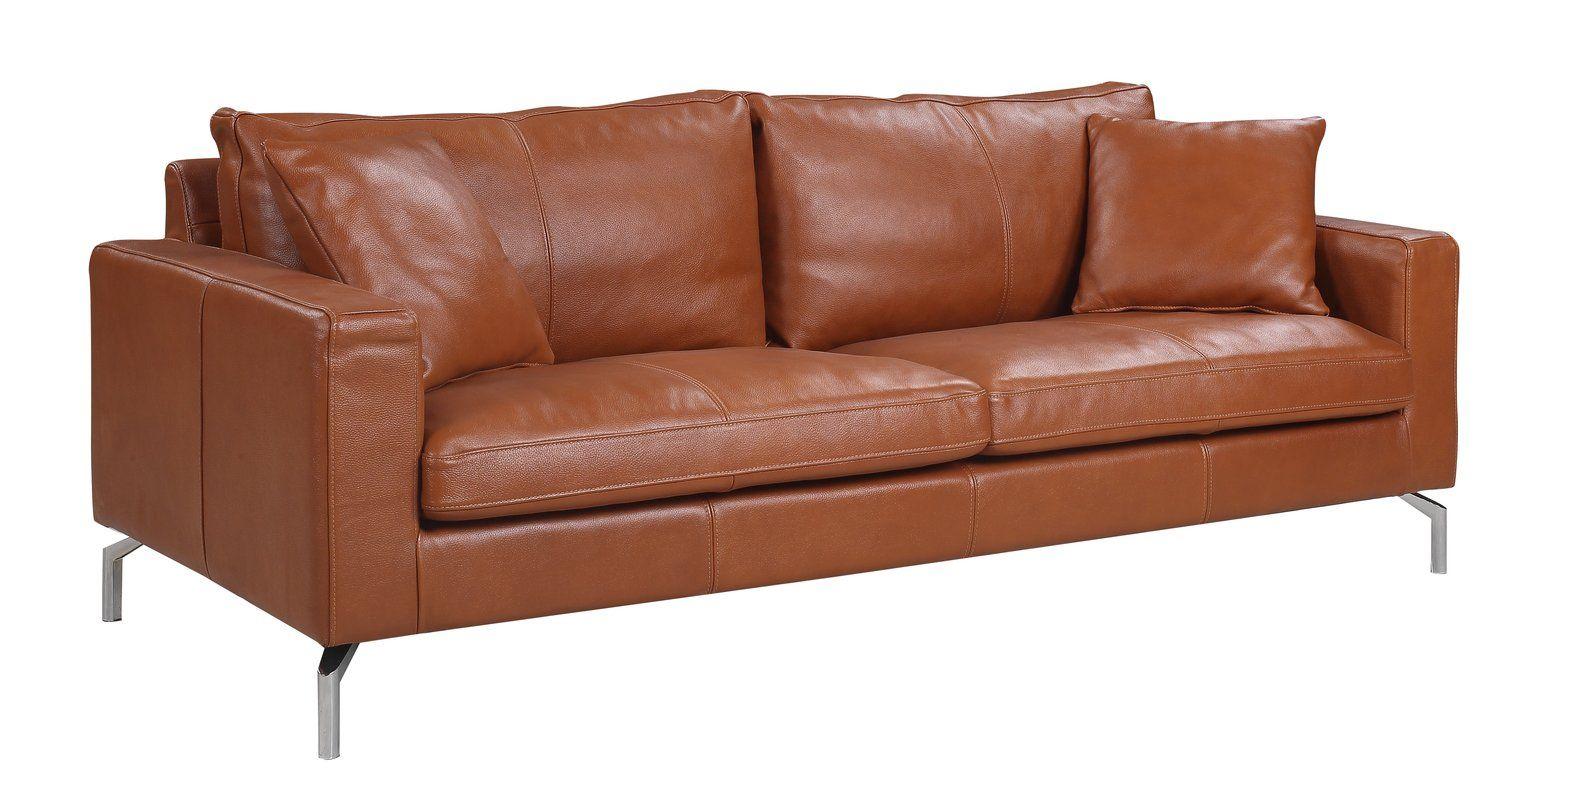 Best Nyyear Mid Century Modern Plush Top Grain Leather Sofa Mid Century Modern Leather Sofa Modern 640 x 480